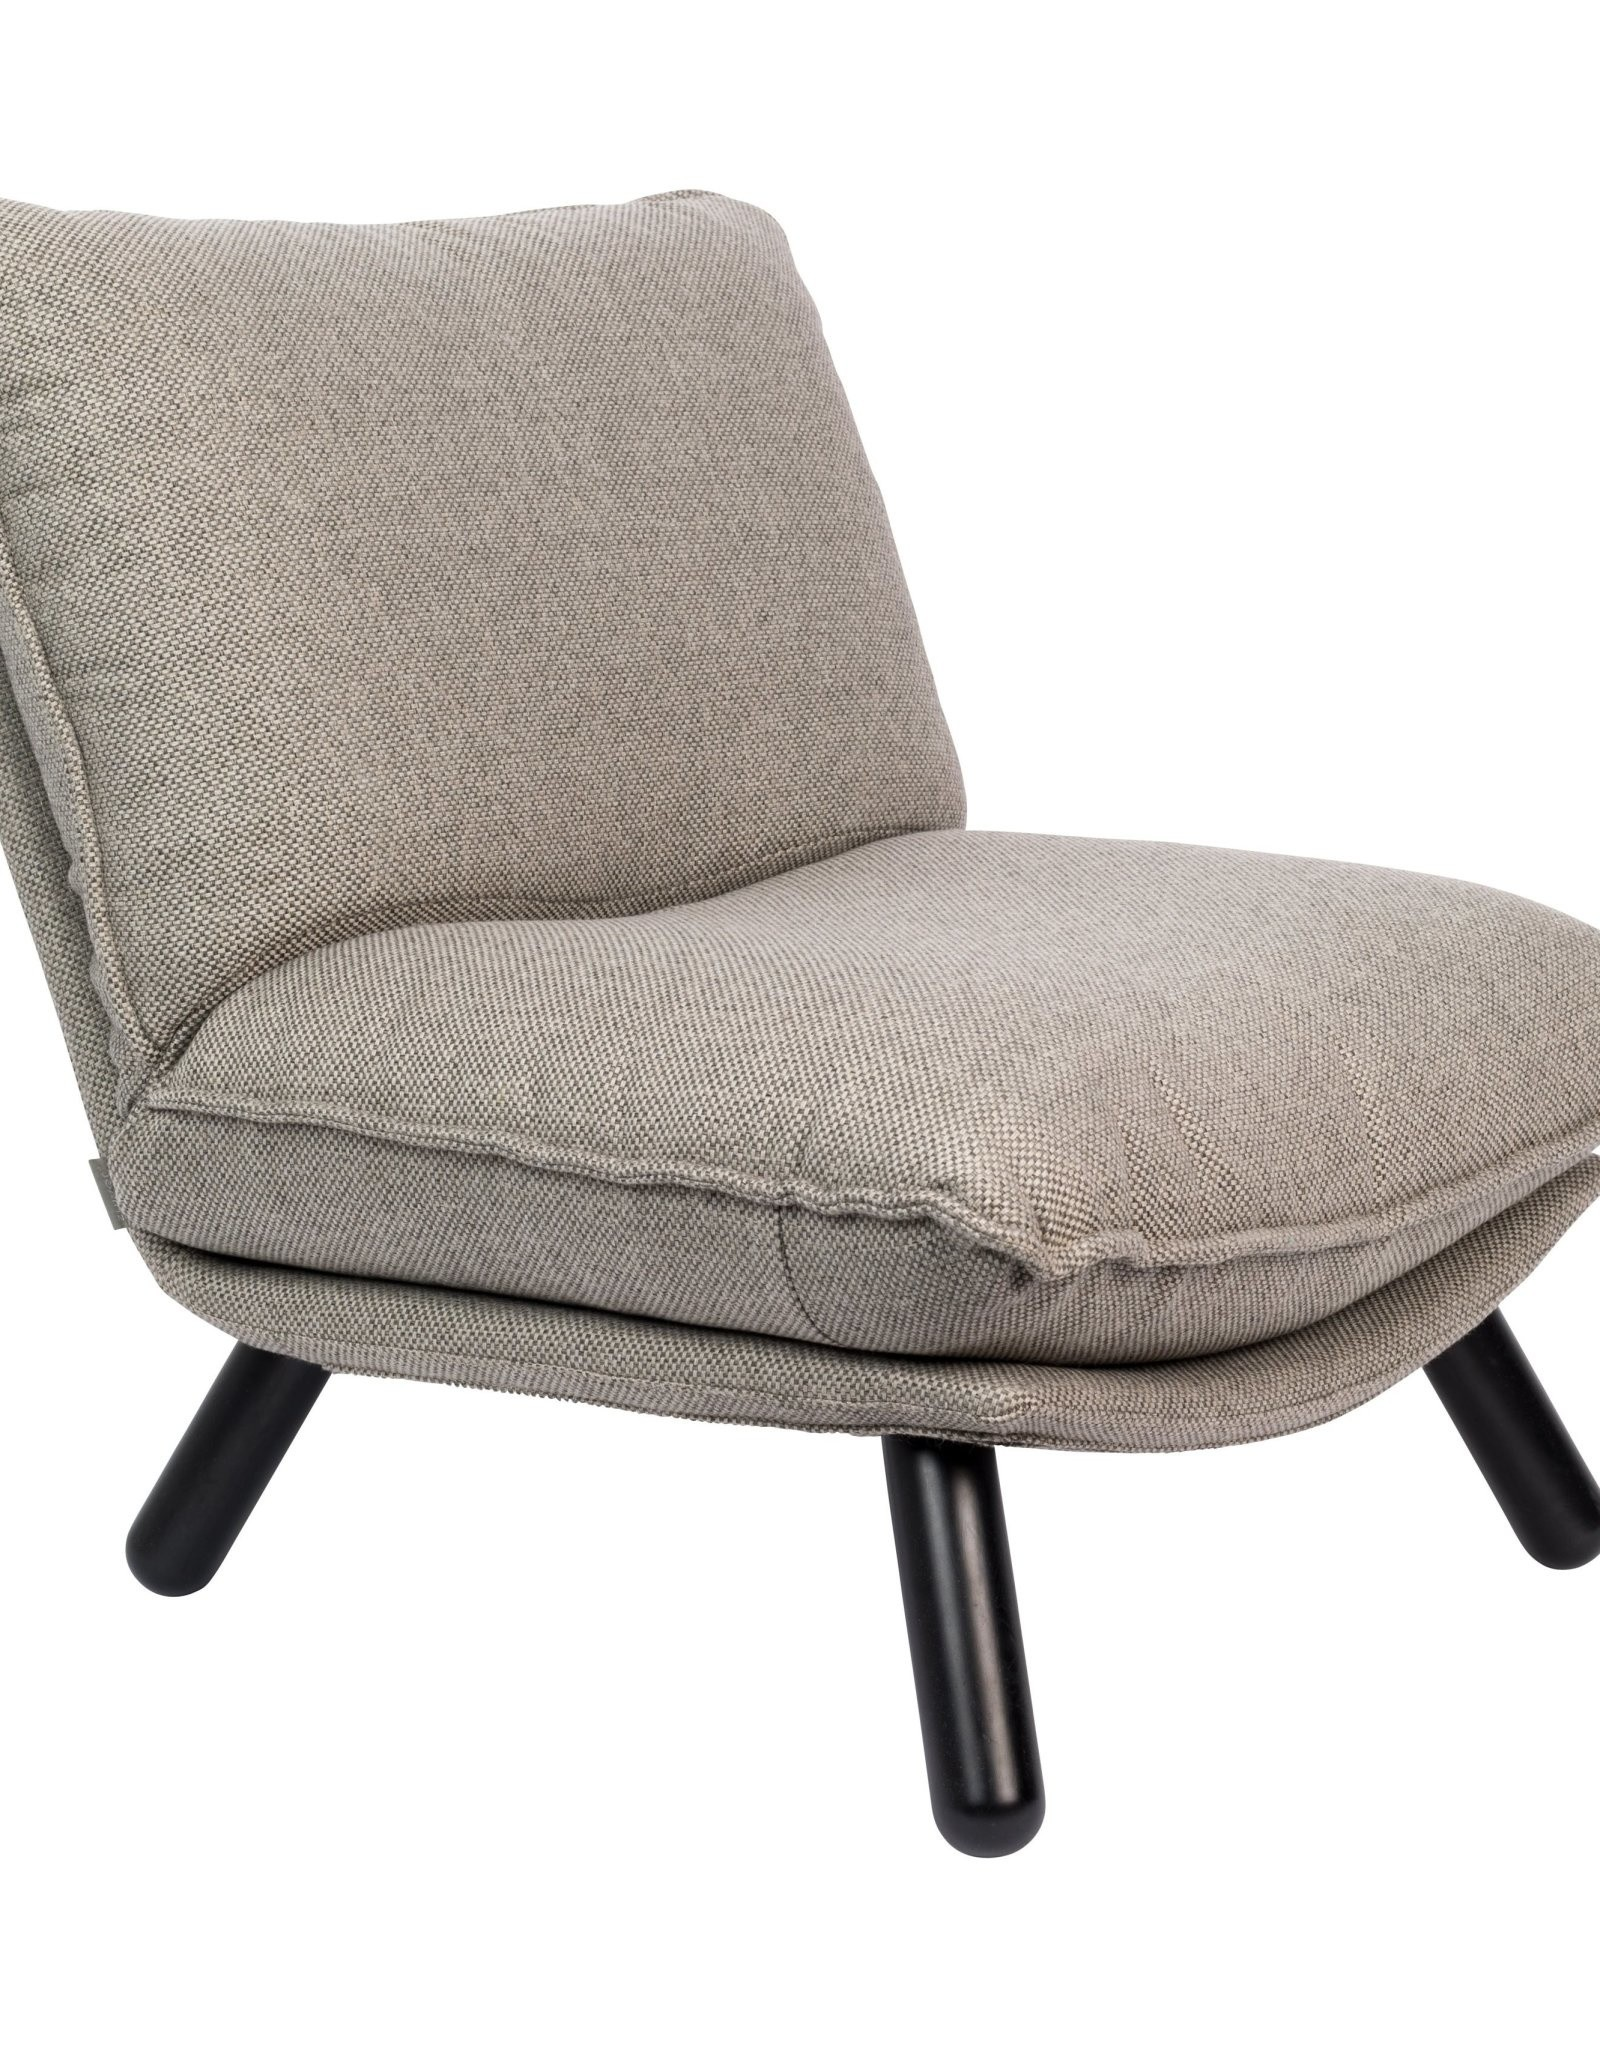 Dutchbone Dutchbone - Long chair lazy sack - light grey